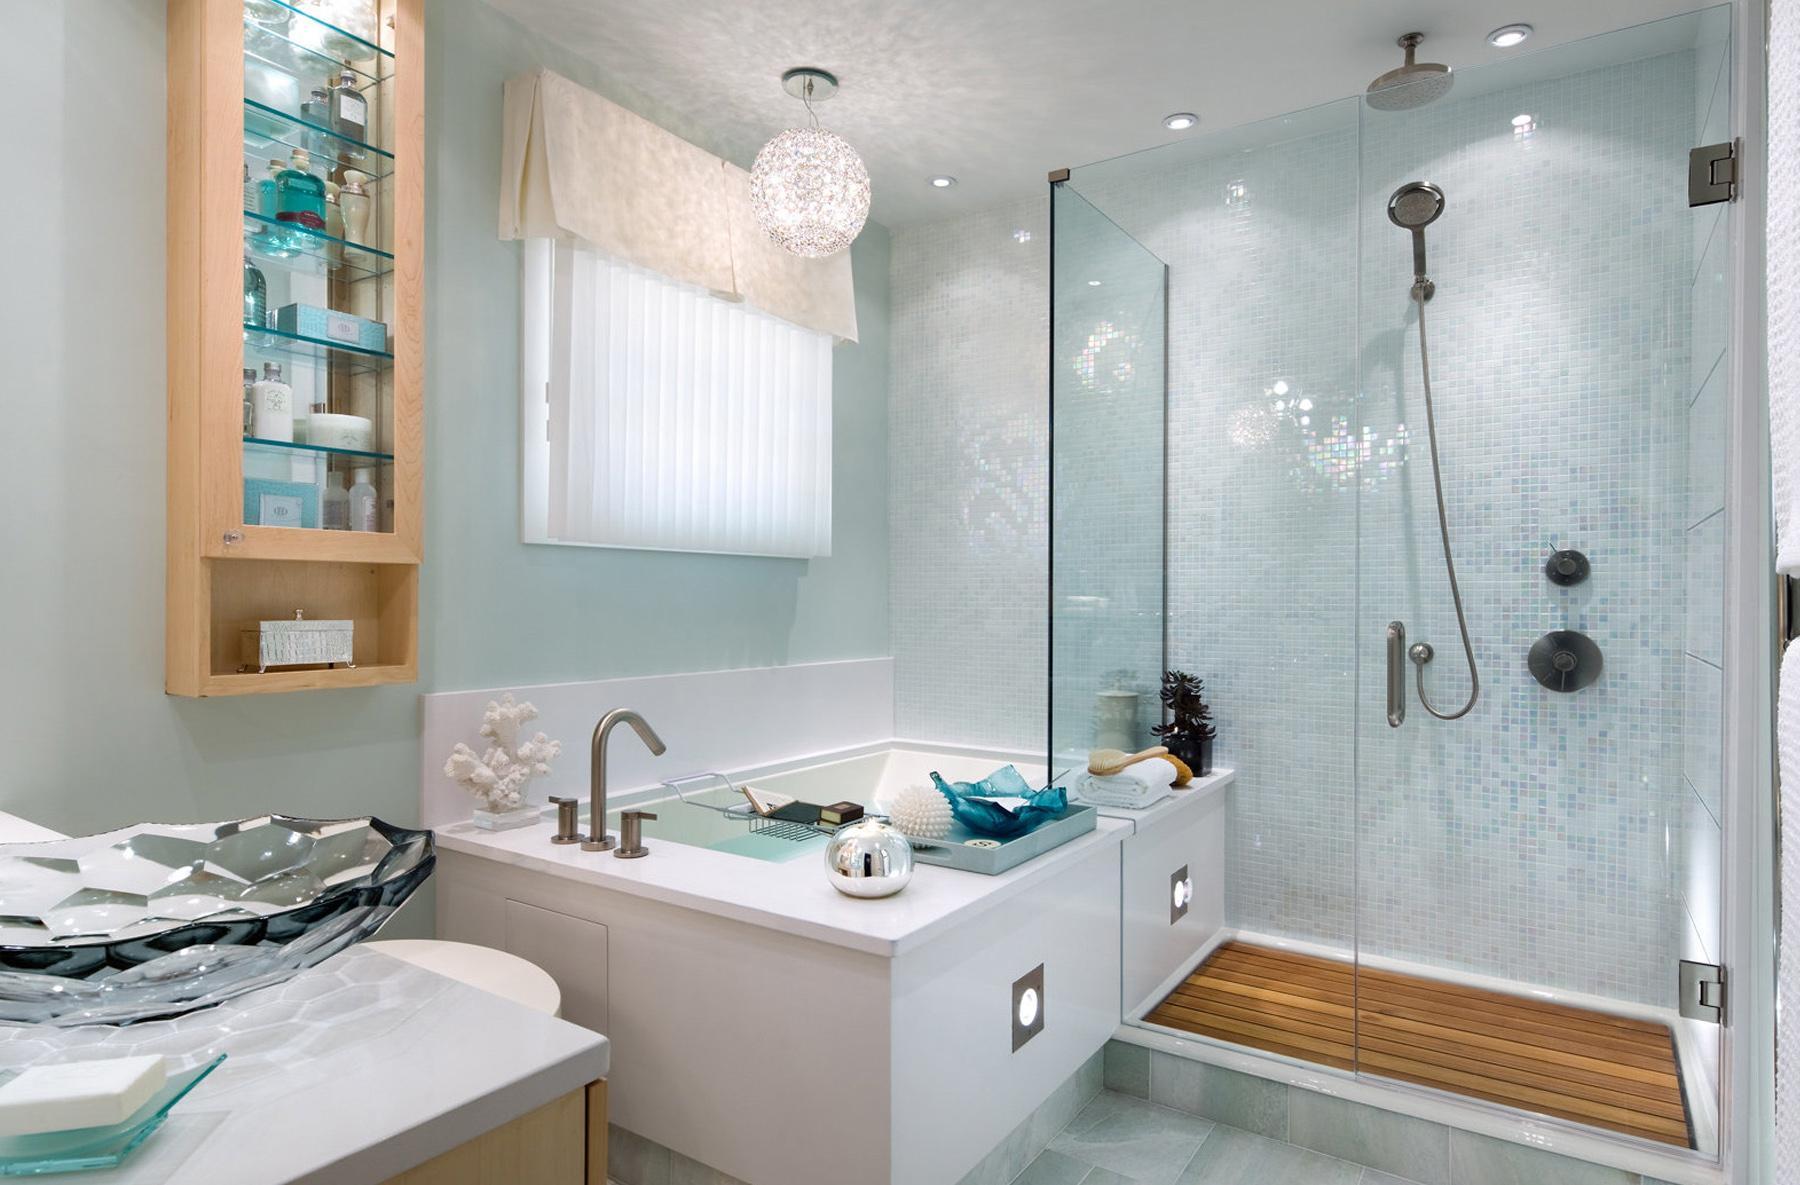 Мятно-белая ванная комната без унитаза